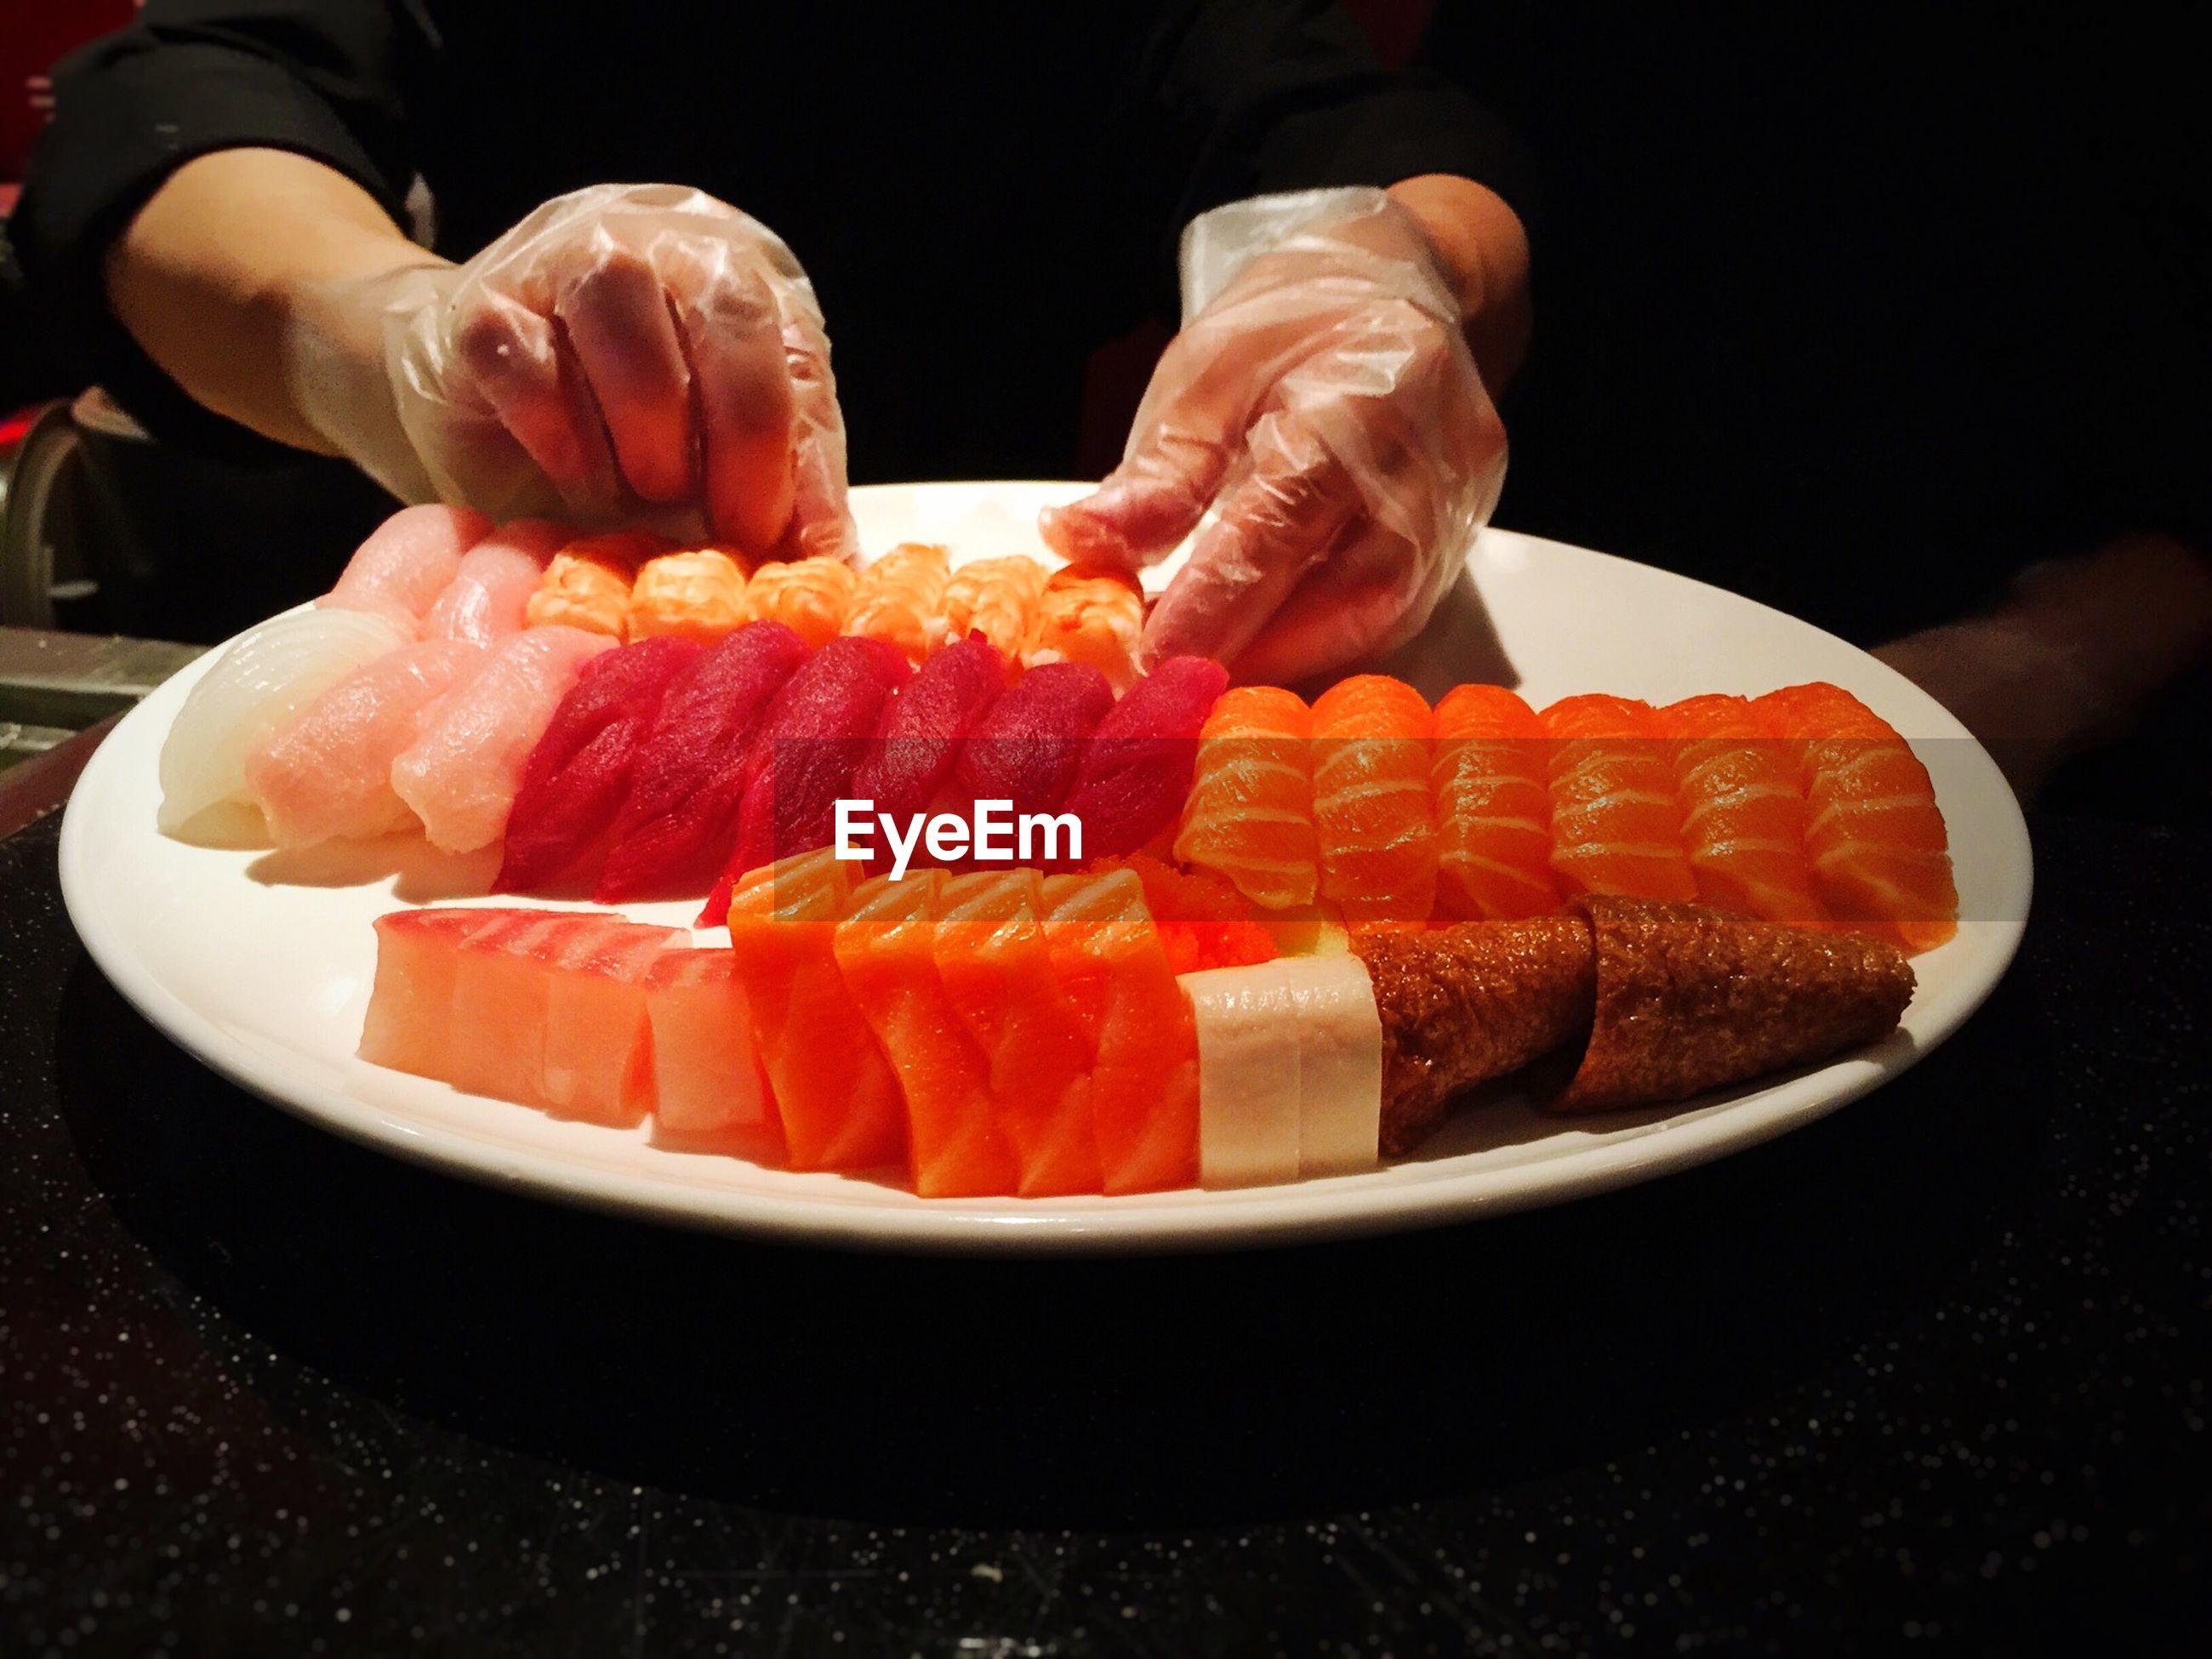 Cropped image of hand arranging salmon sashimi on plate